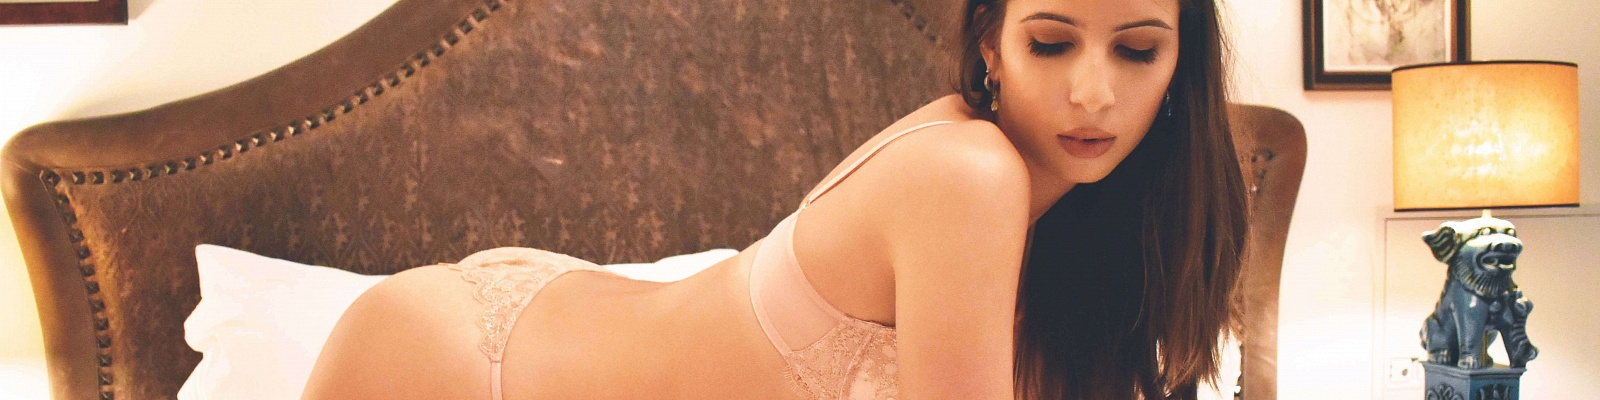 Natalia Felix's Cover Photo